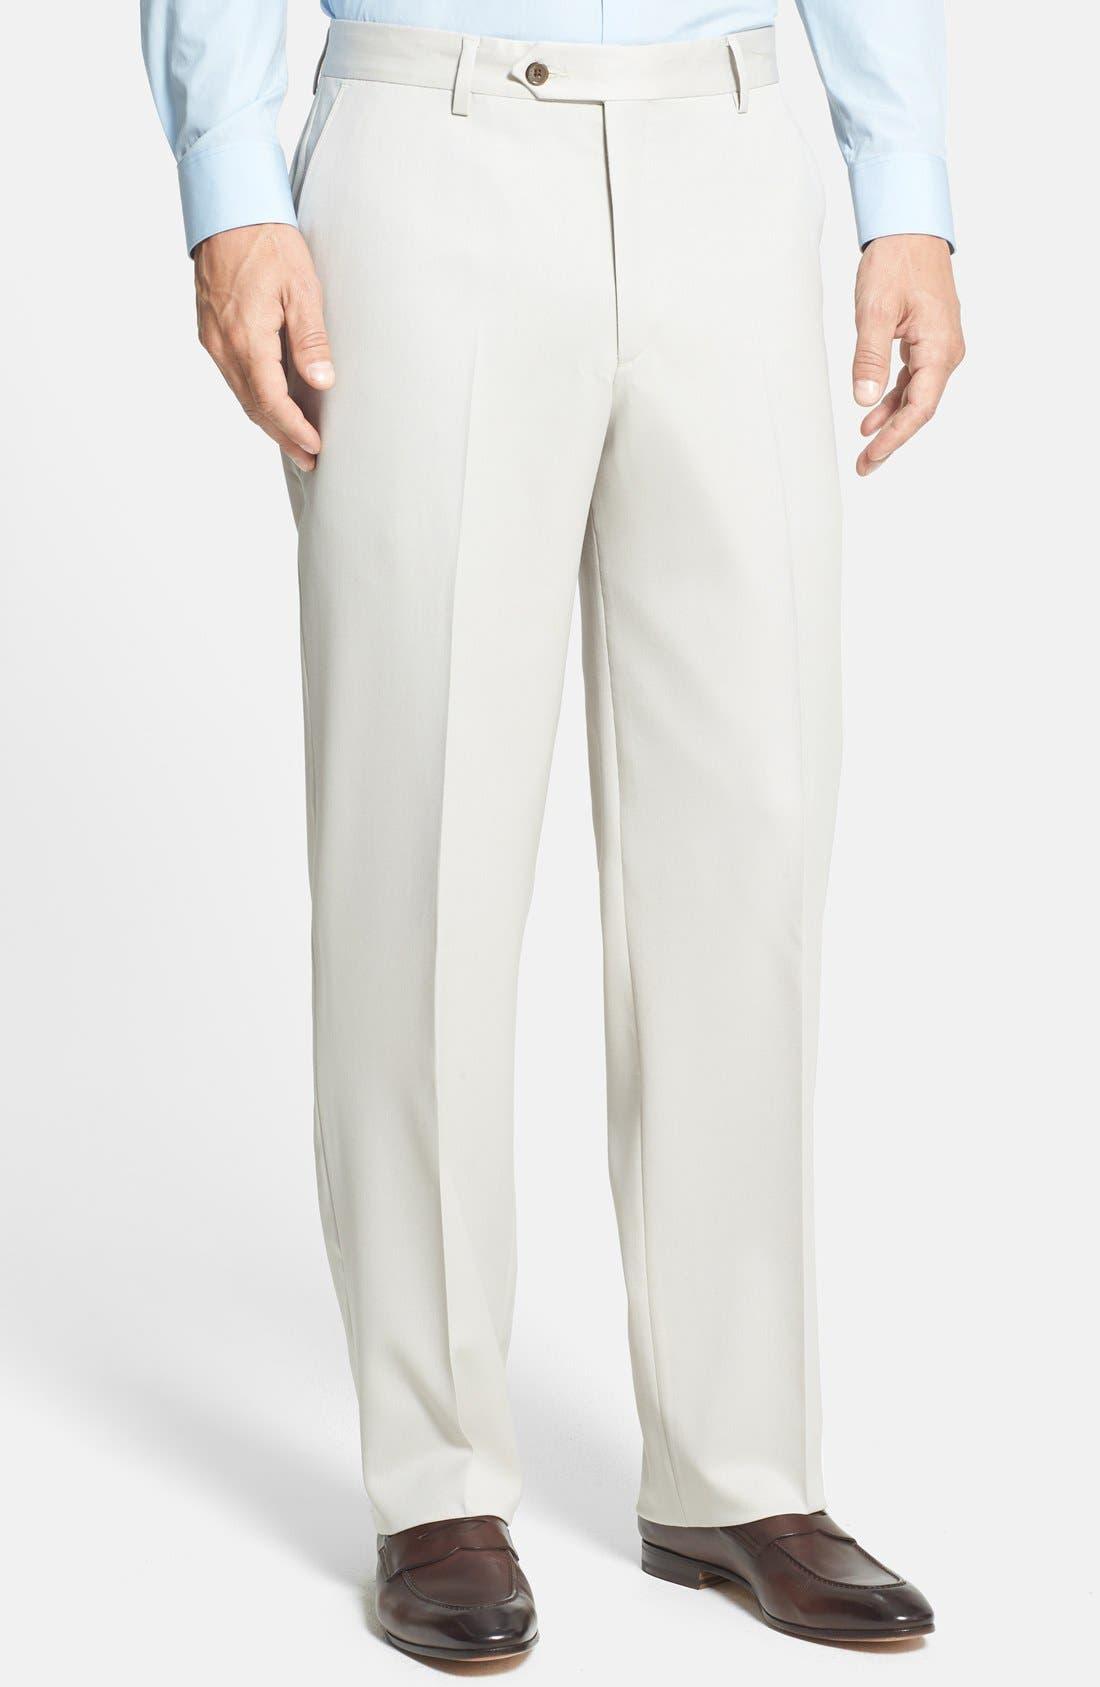 BERLE, Flat Front Wool Gabardine Trousers, Main thumbnail 1, color, STONE